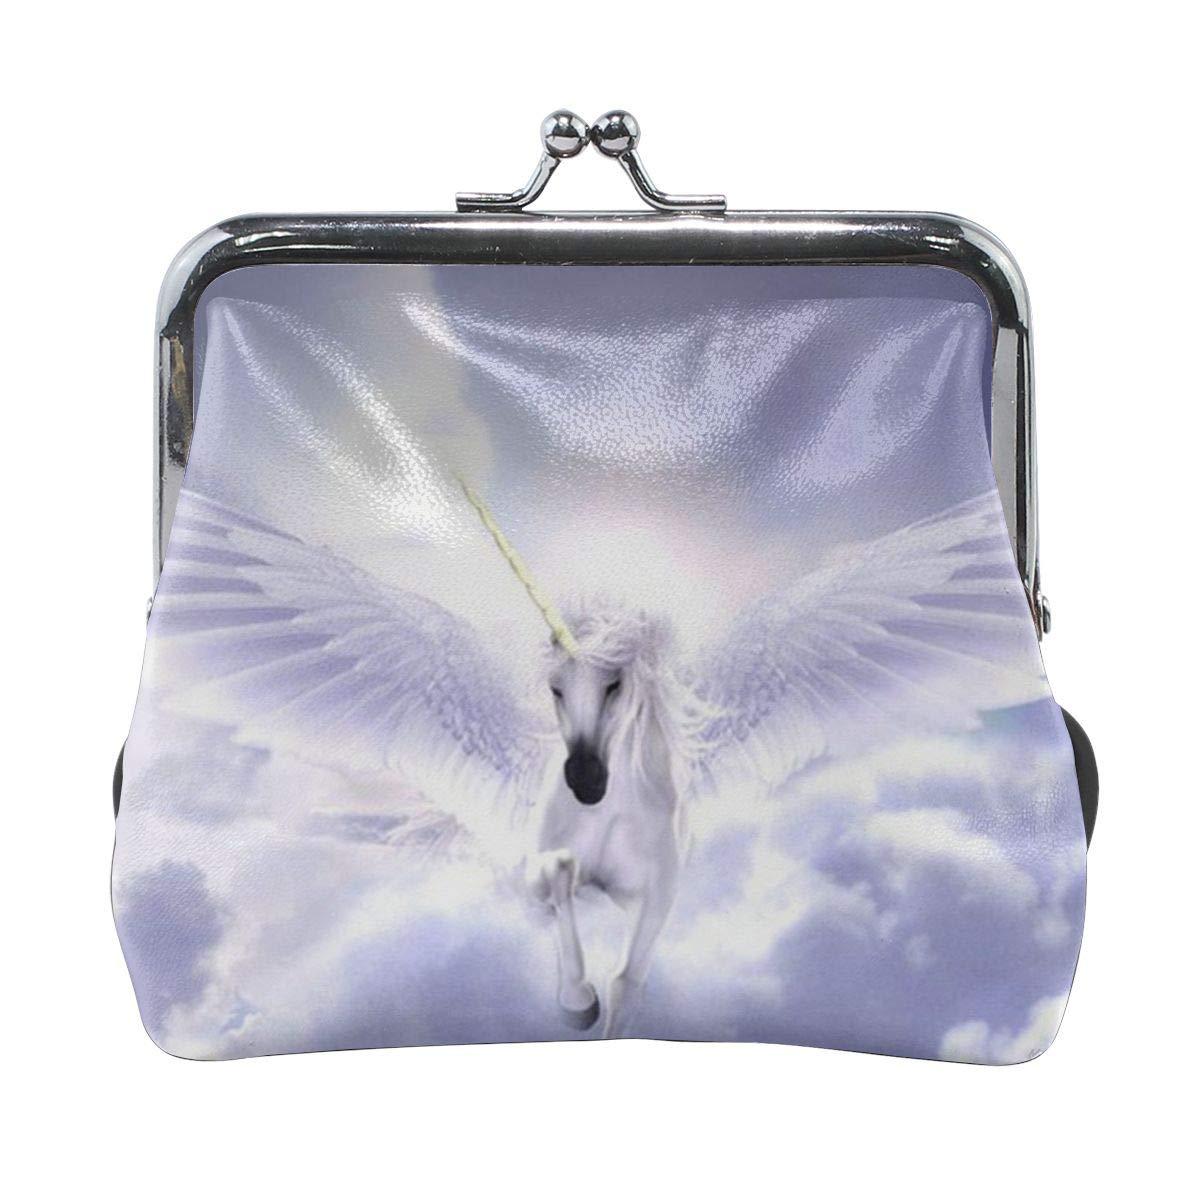 Pegasus Unicorn Cute Buckle Coin Purses Buckle Buckle Change Purse Wallets